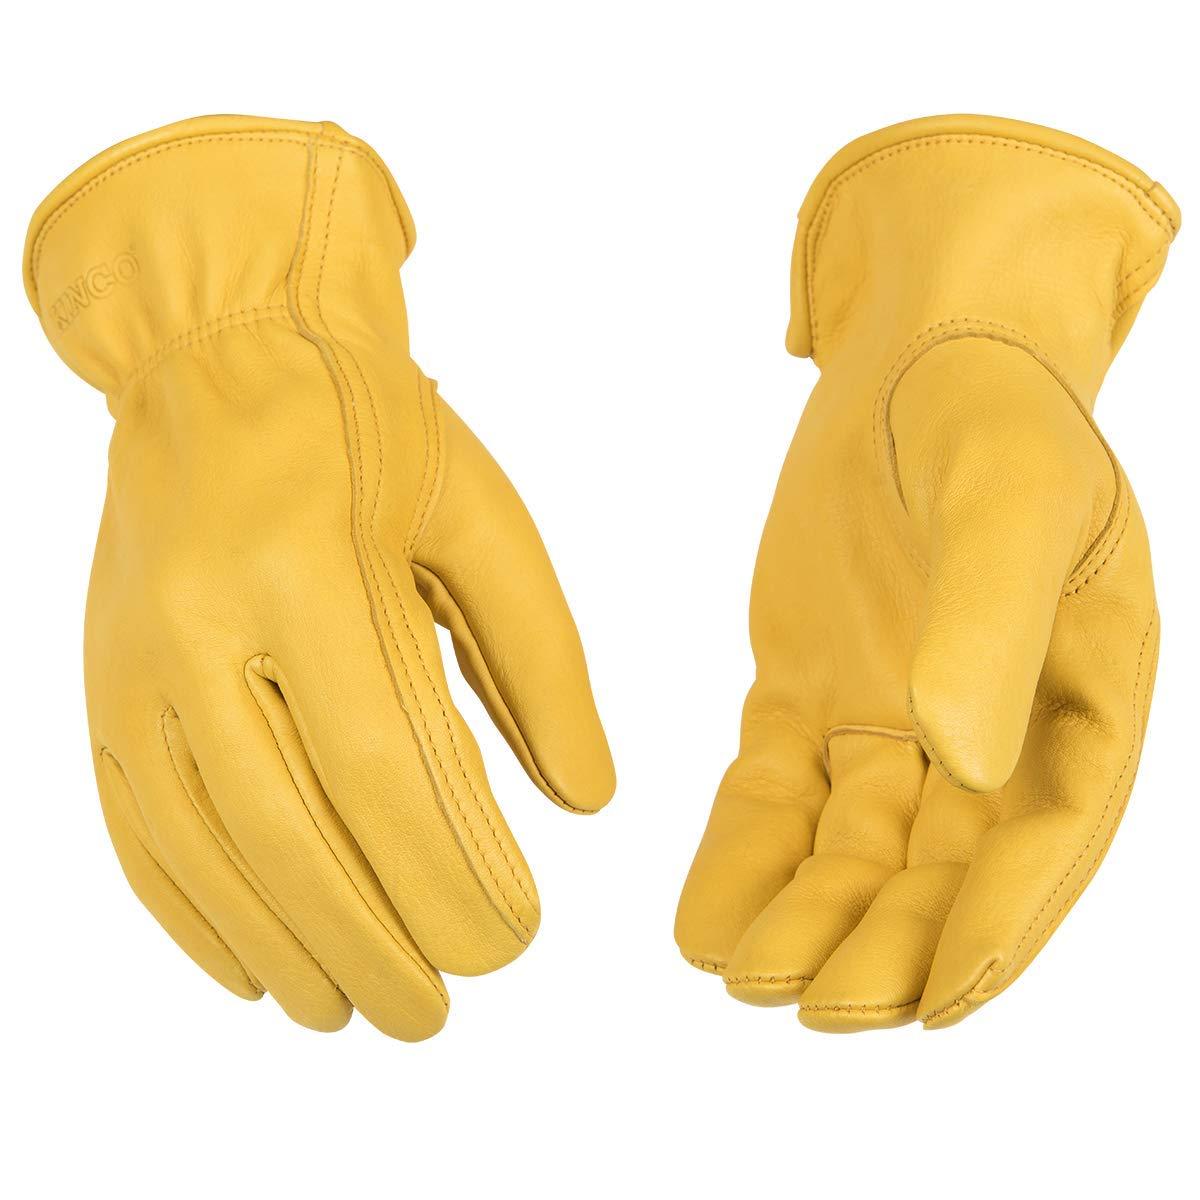 Inexpensive Kinco - Unlined Premium Deerskin Tulsa Mall 90 Work Gloves Leather